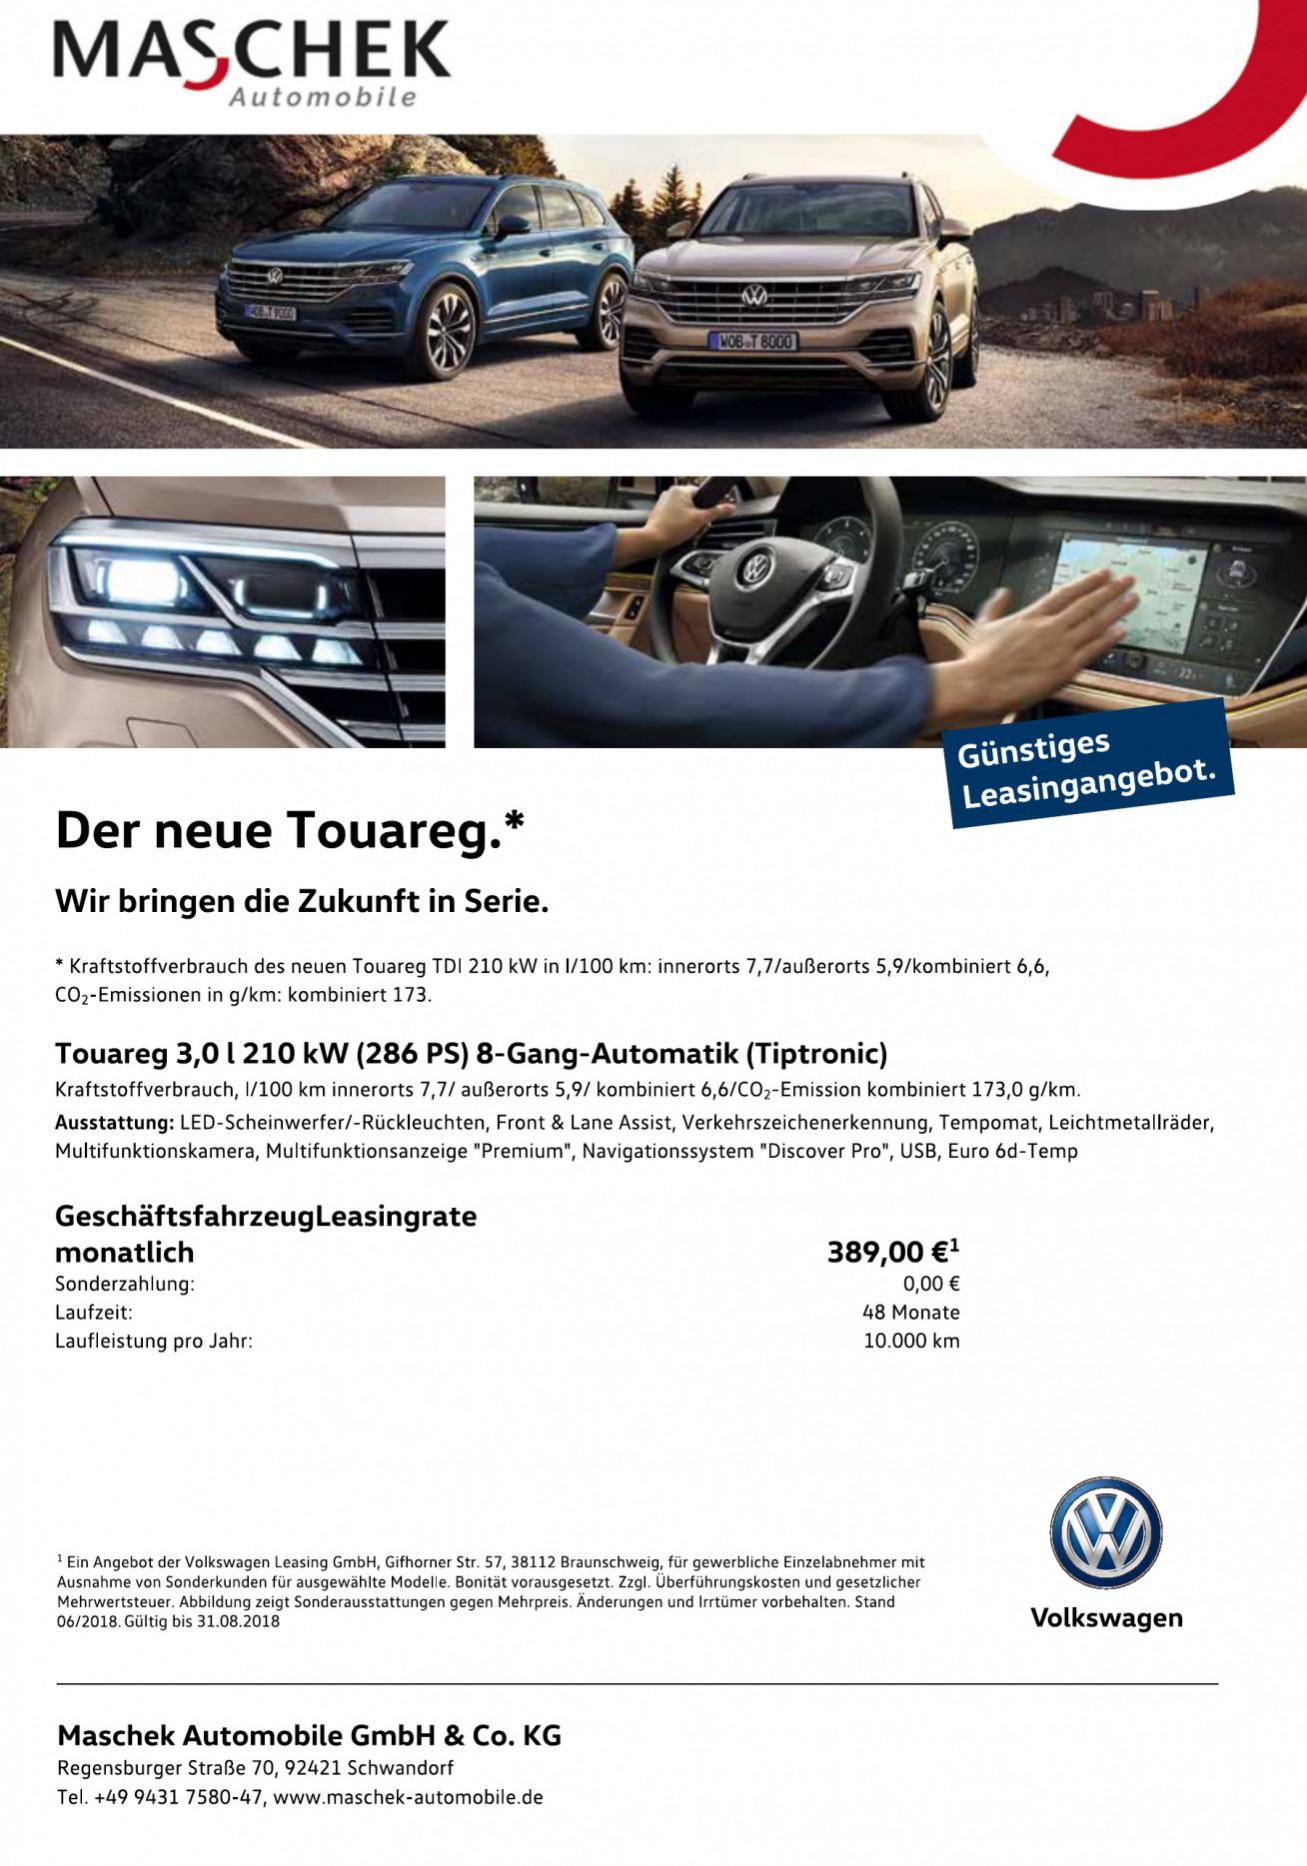 Maschek Automobile GmbH & Co. KG